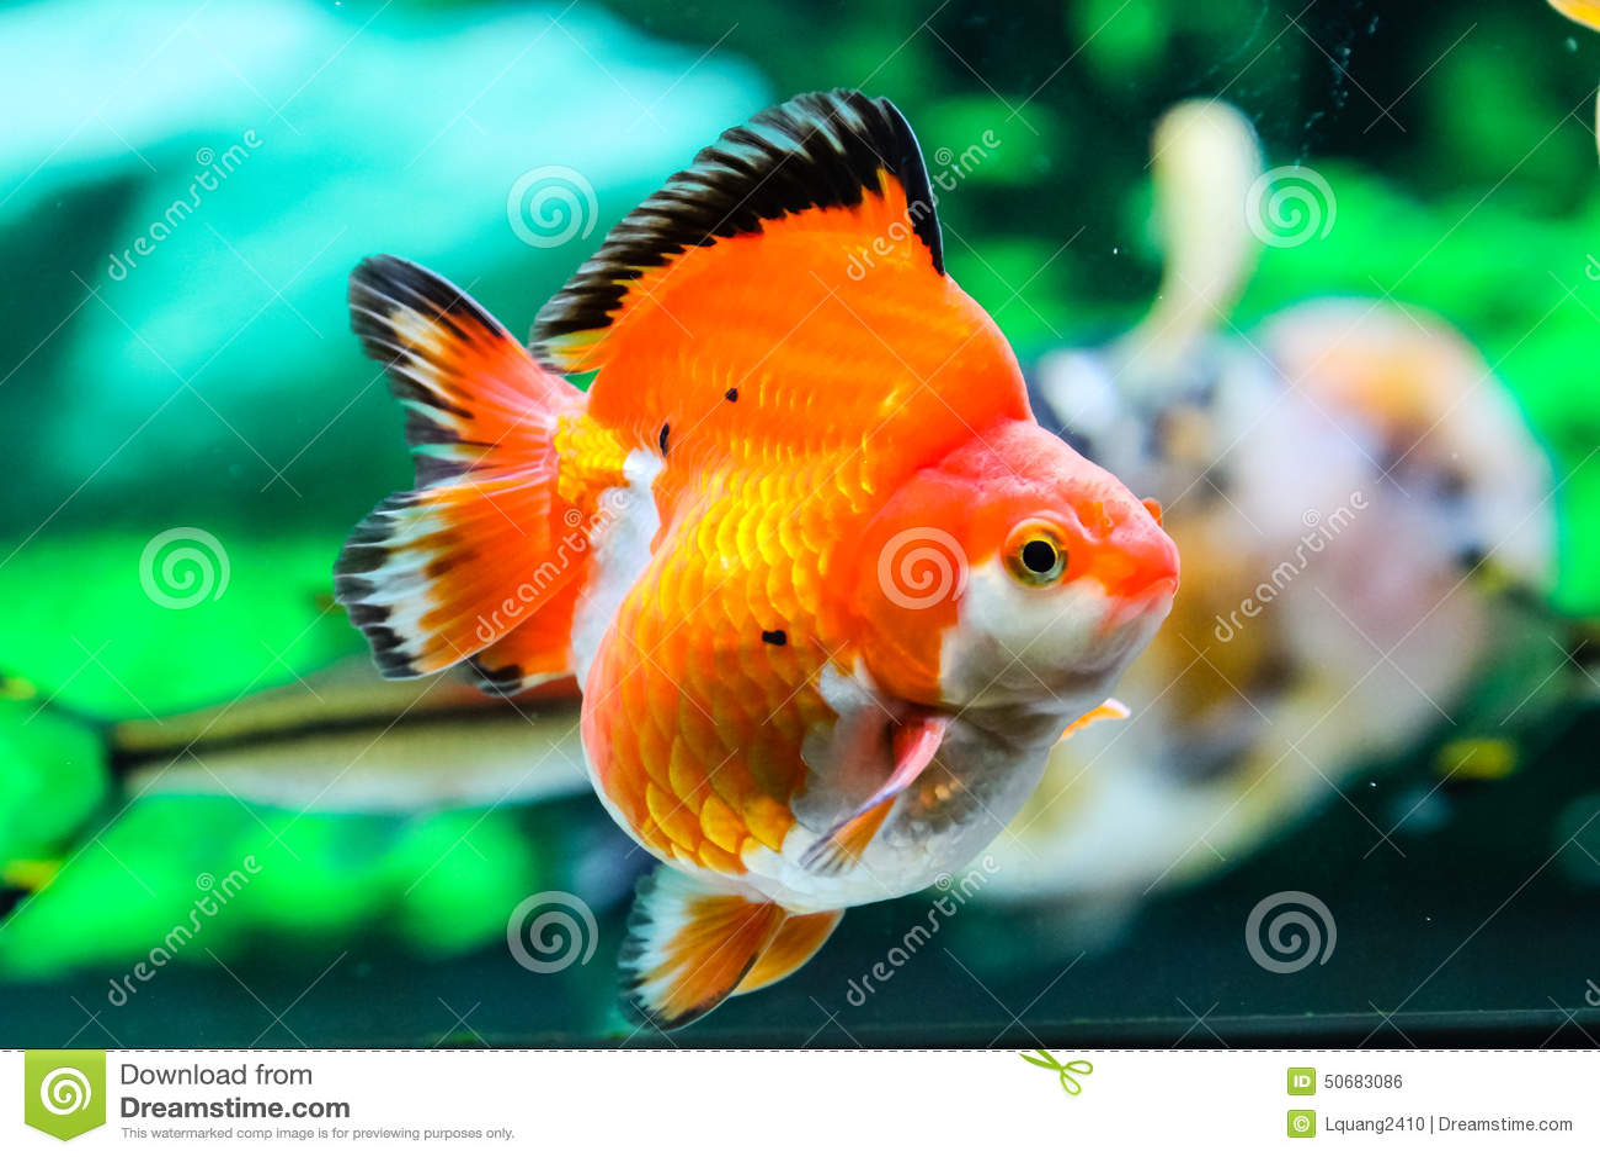 Download 关闭在水族馆的金鱼 库存照片. 图片 包括有 敌意, 金子, 弯脚的, 水族馆, betsy, 自由, 宠物 - 50683086